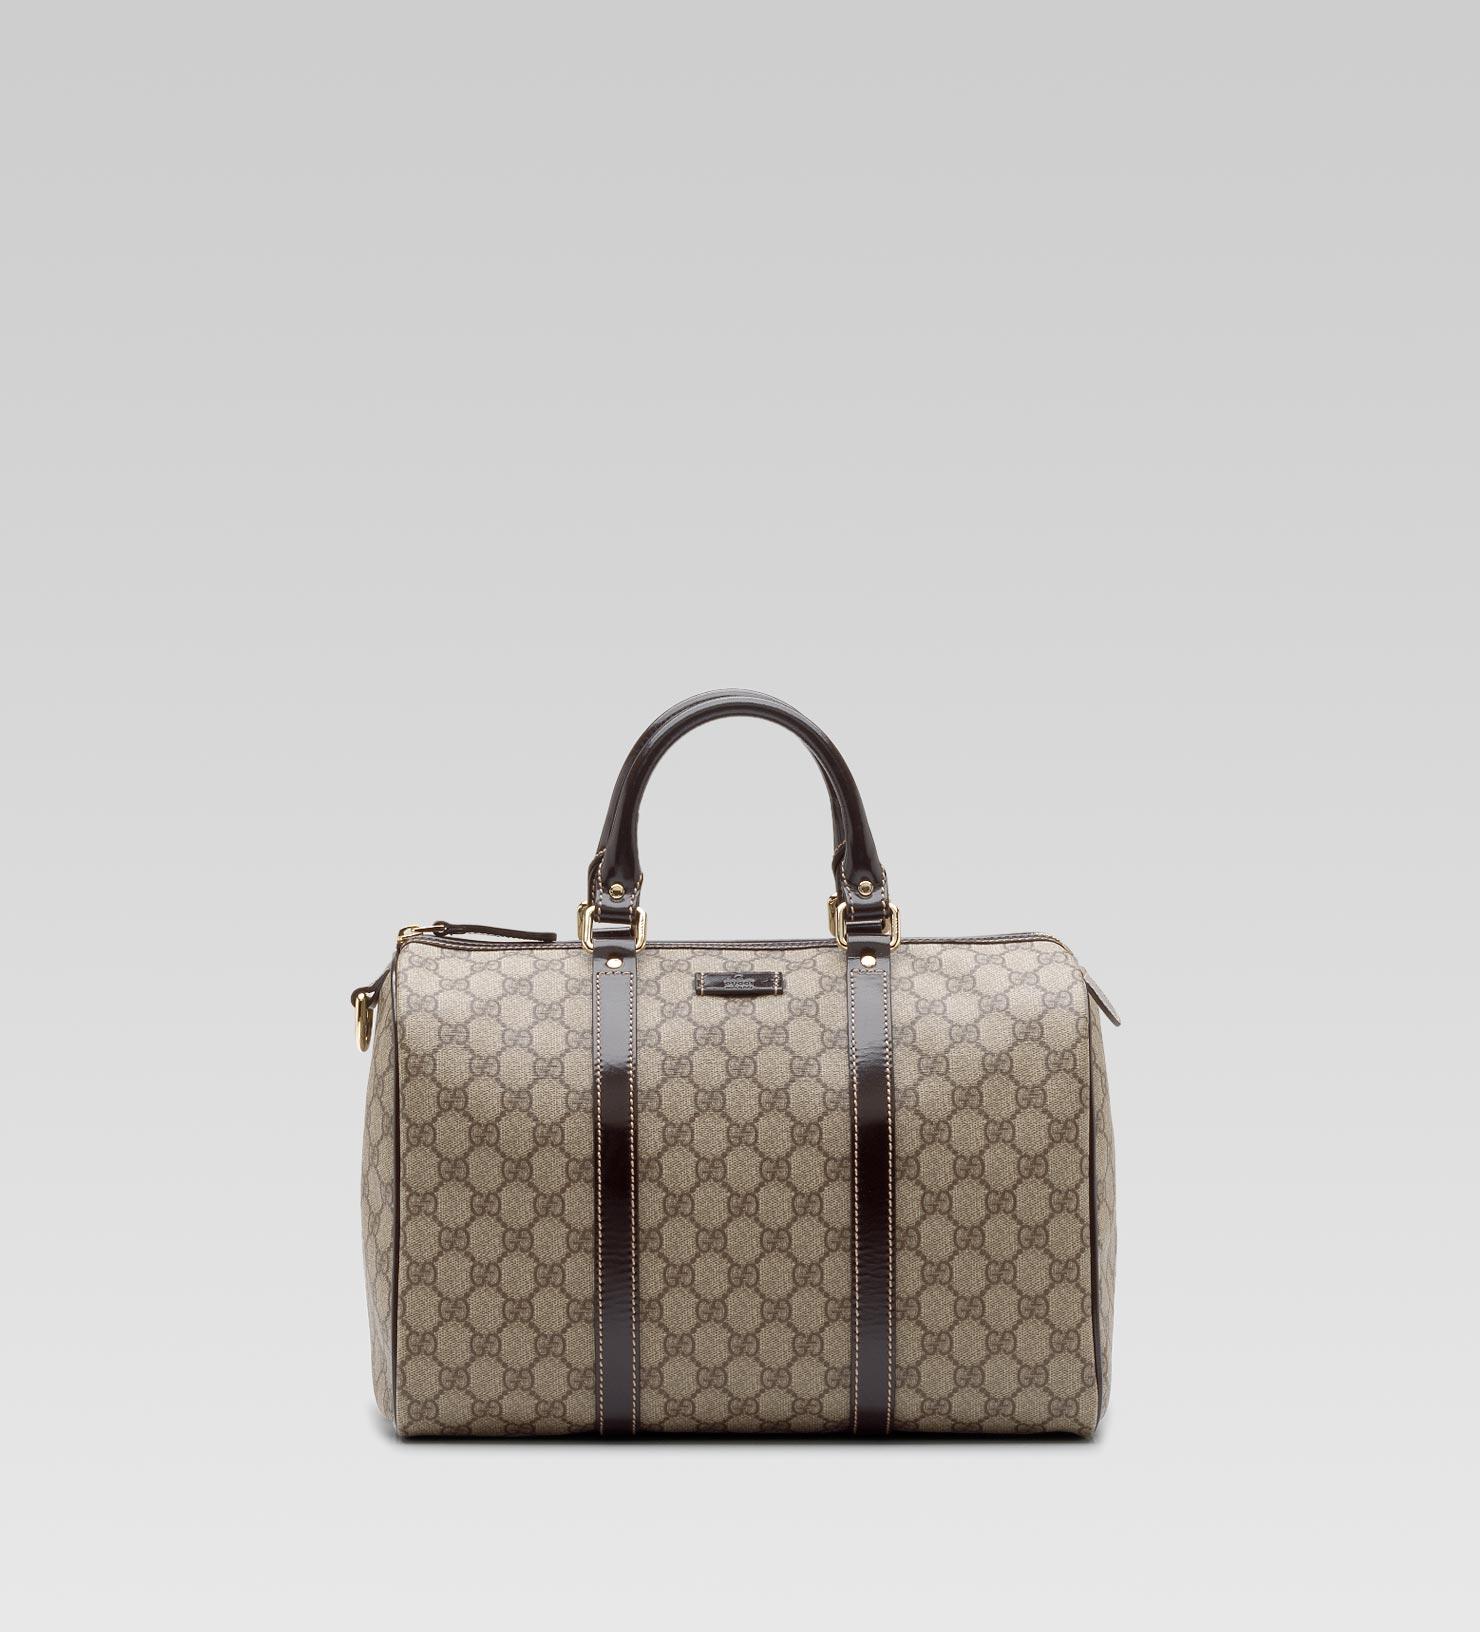 79b1486ac414 Gucci Beige Gg Plus Joy Patent Detail Boston Bag in Natural - Lyst